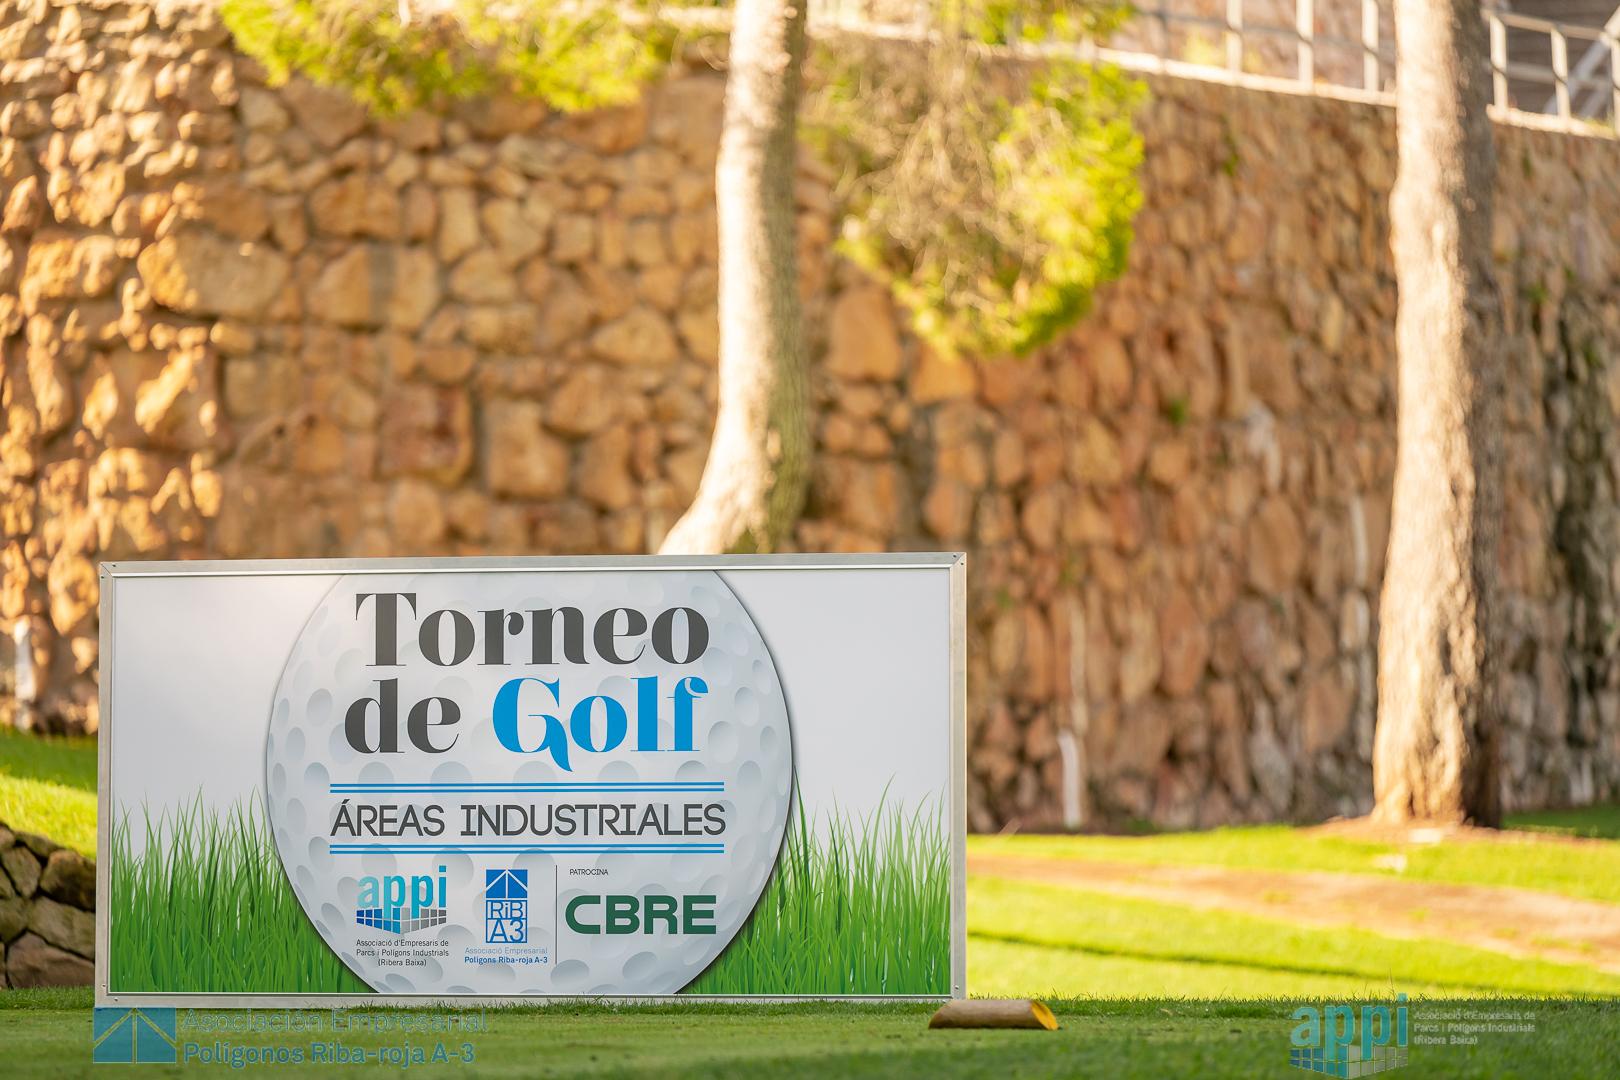 Torneo de Golf Áreas Industriales (Appi- Rib A3)